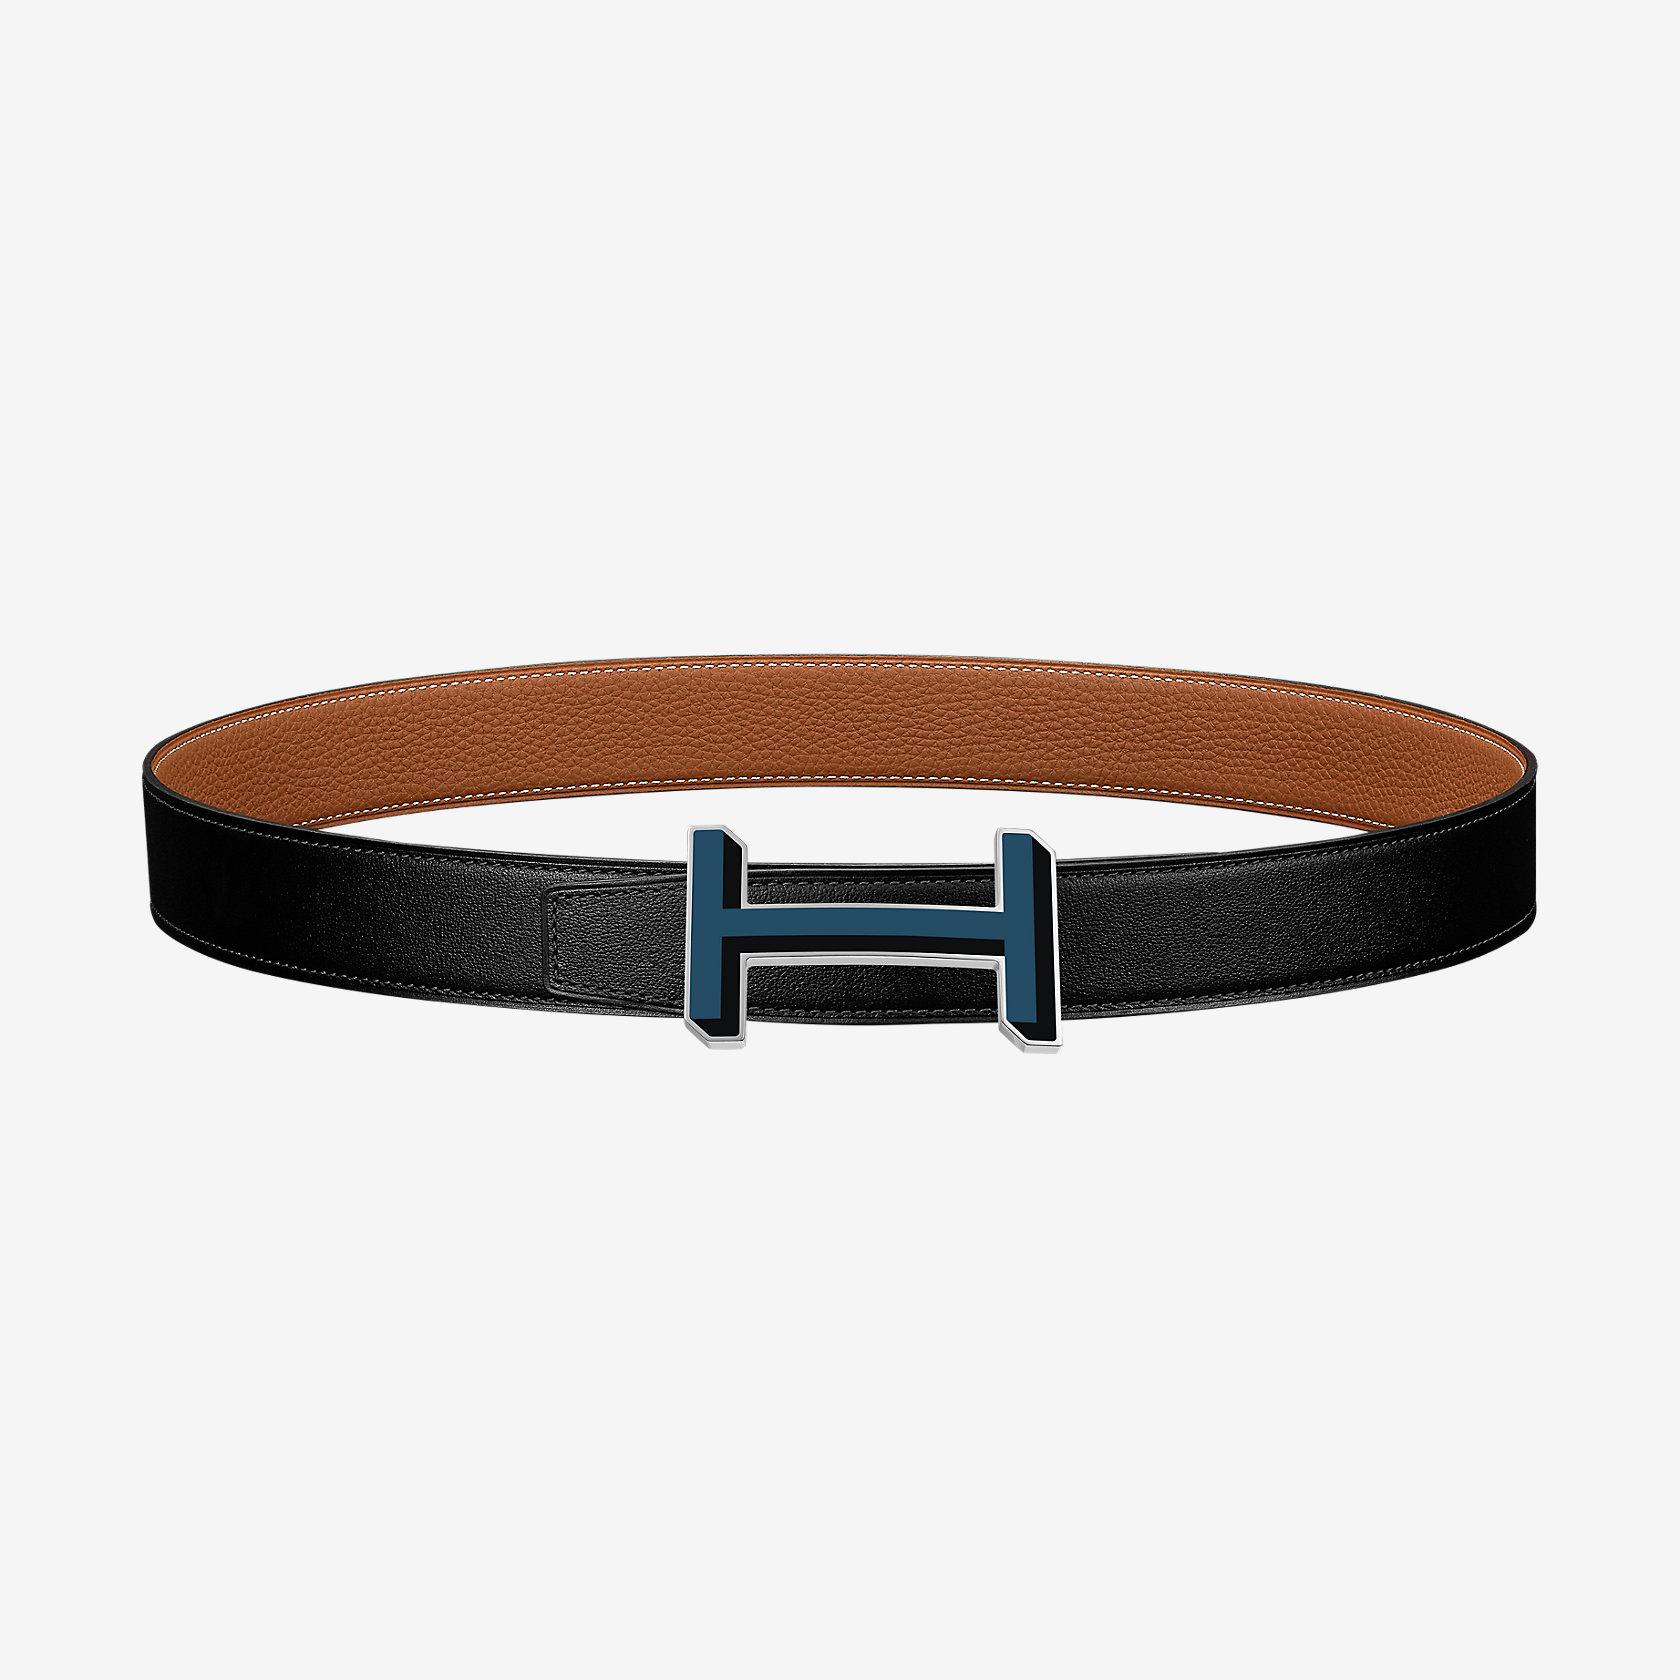 H 3D belt buckle & Reversible leather strap 32 mm